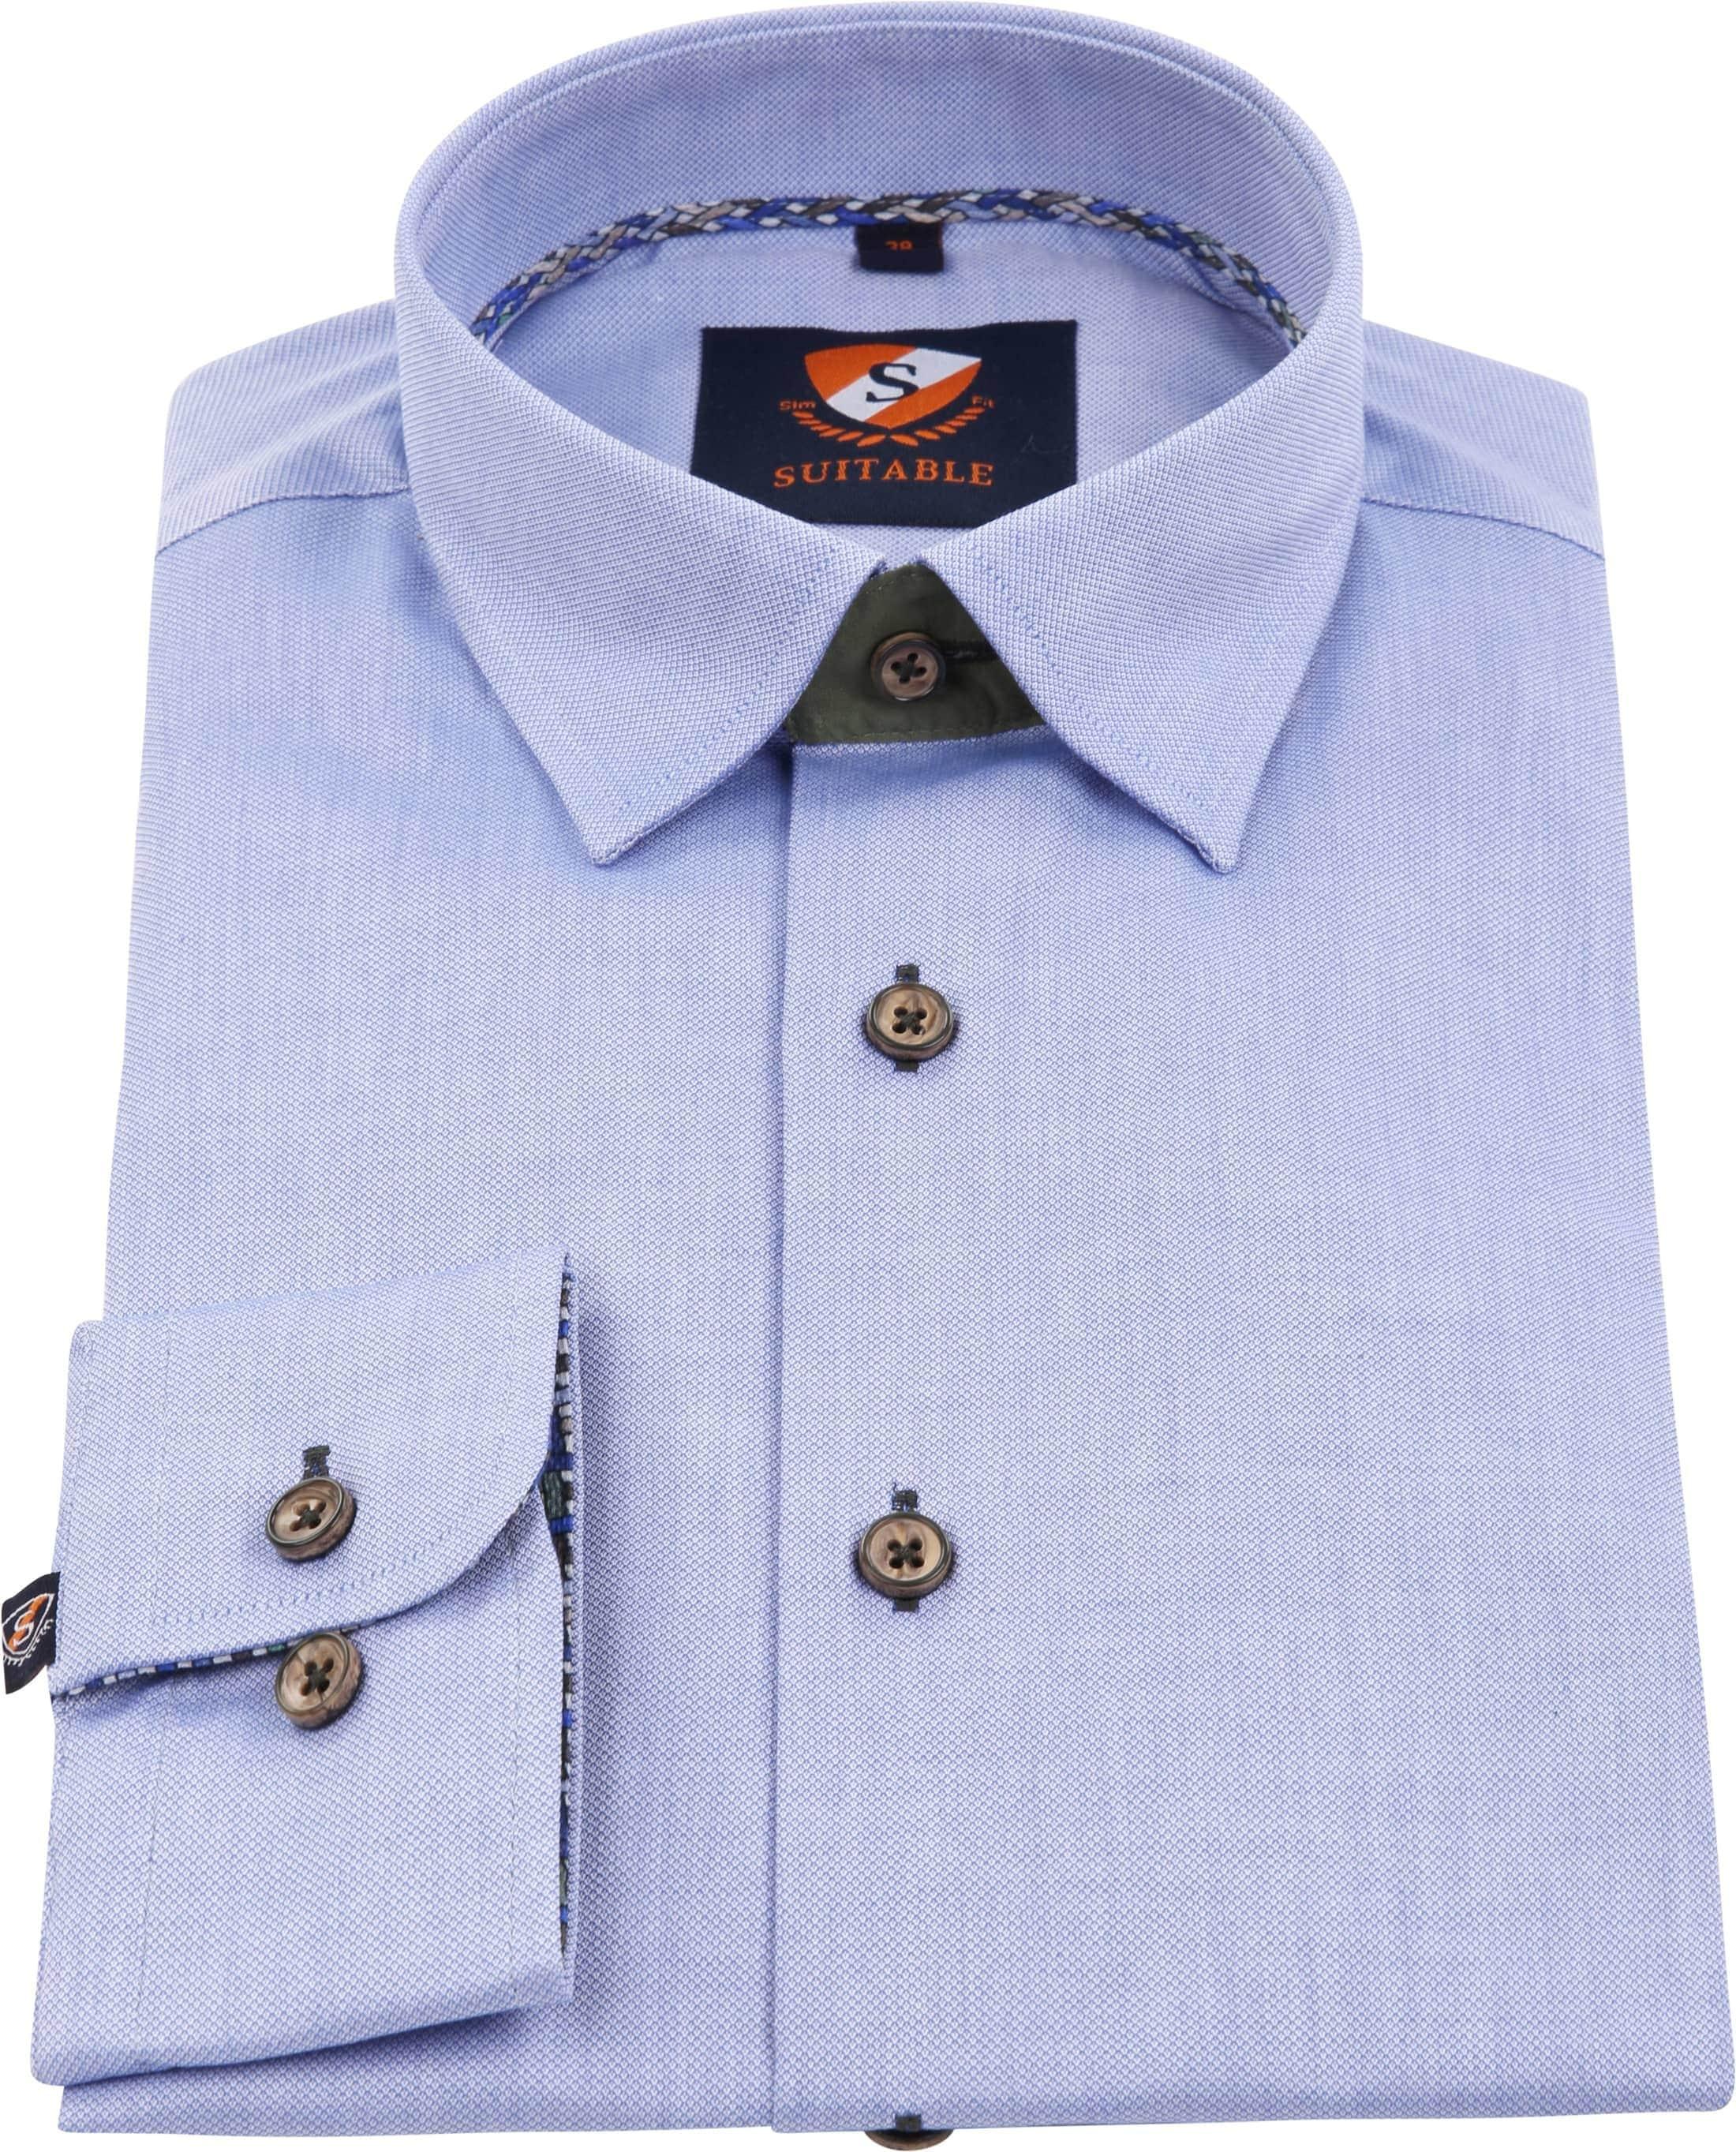 Suitable Overhemd Bluety foto 3